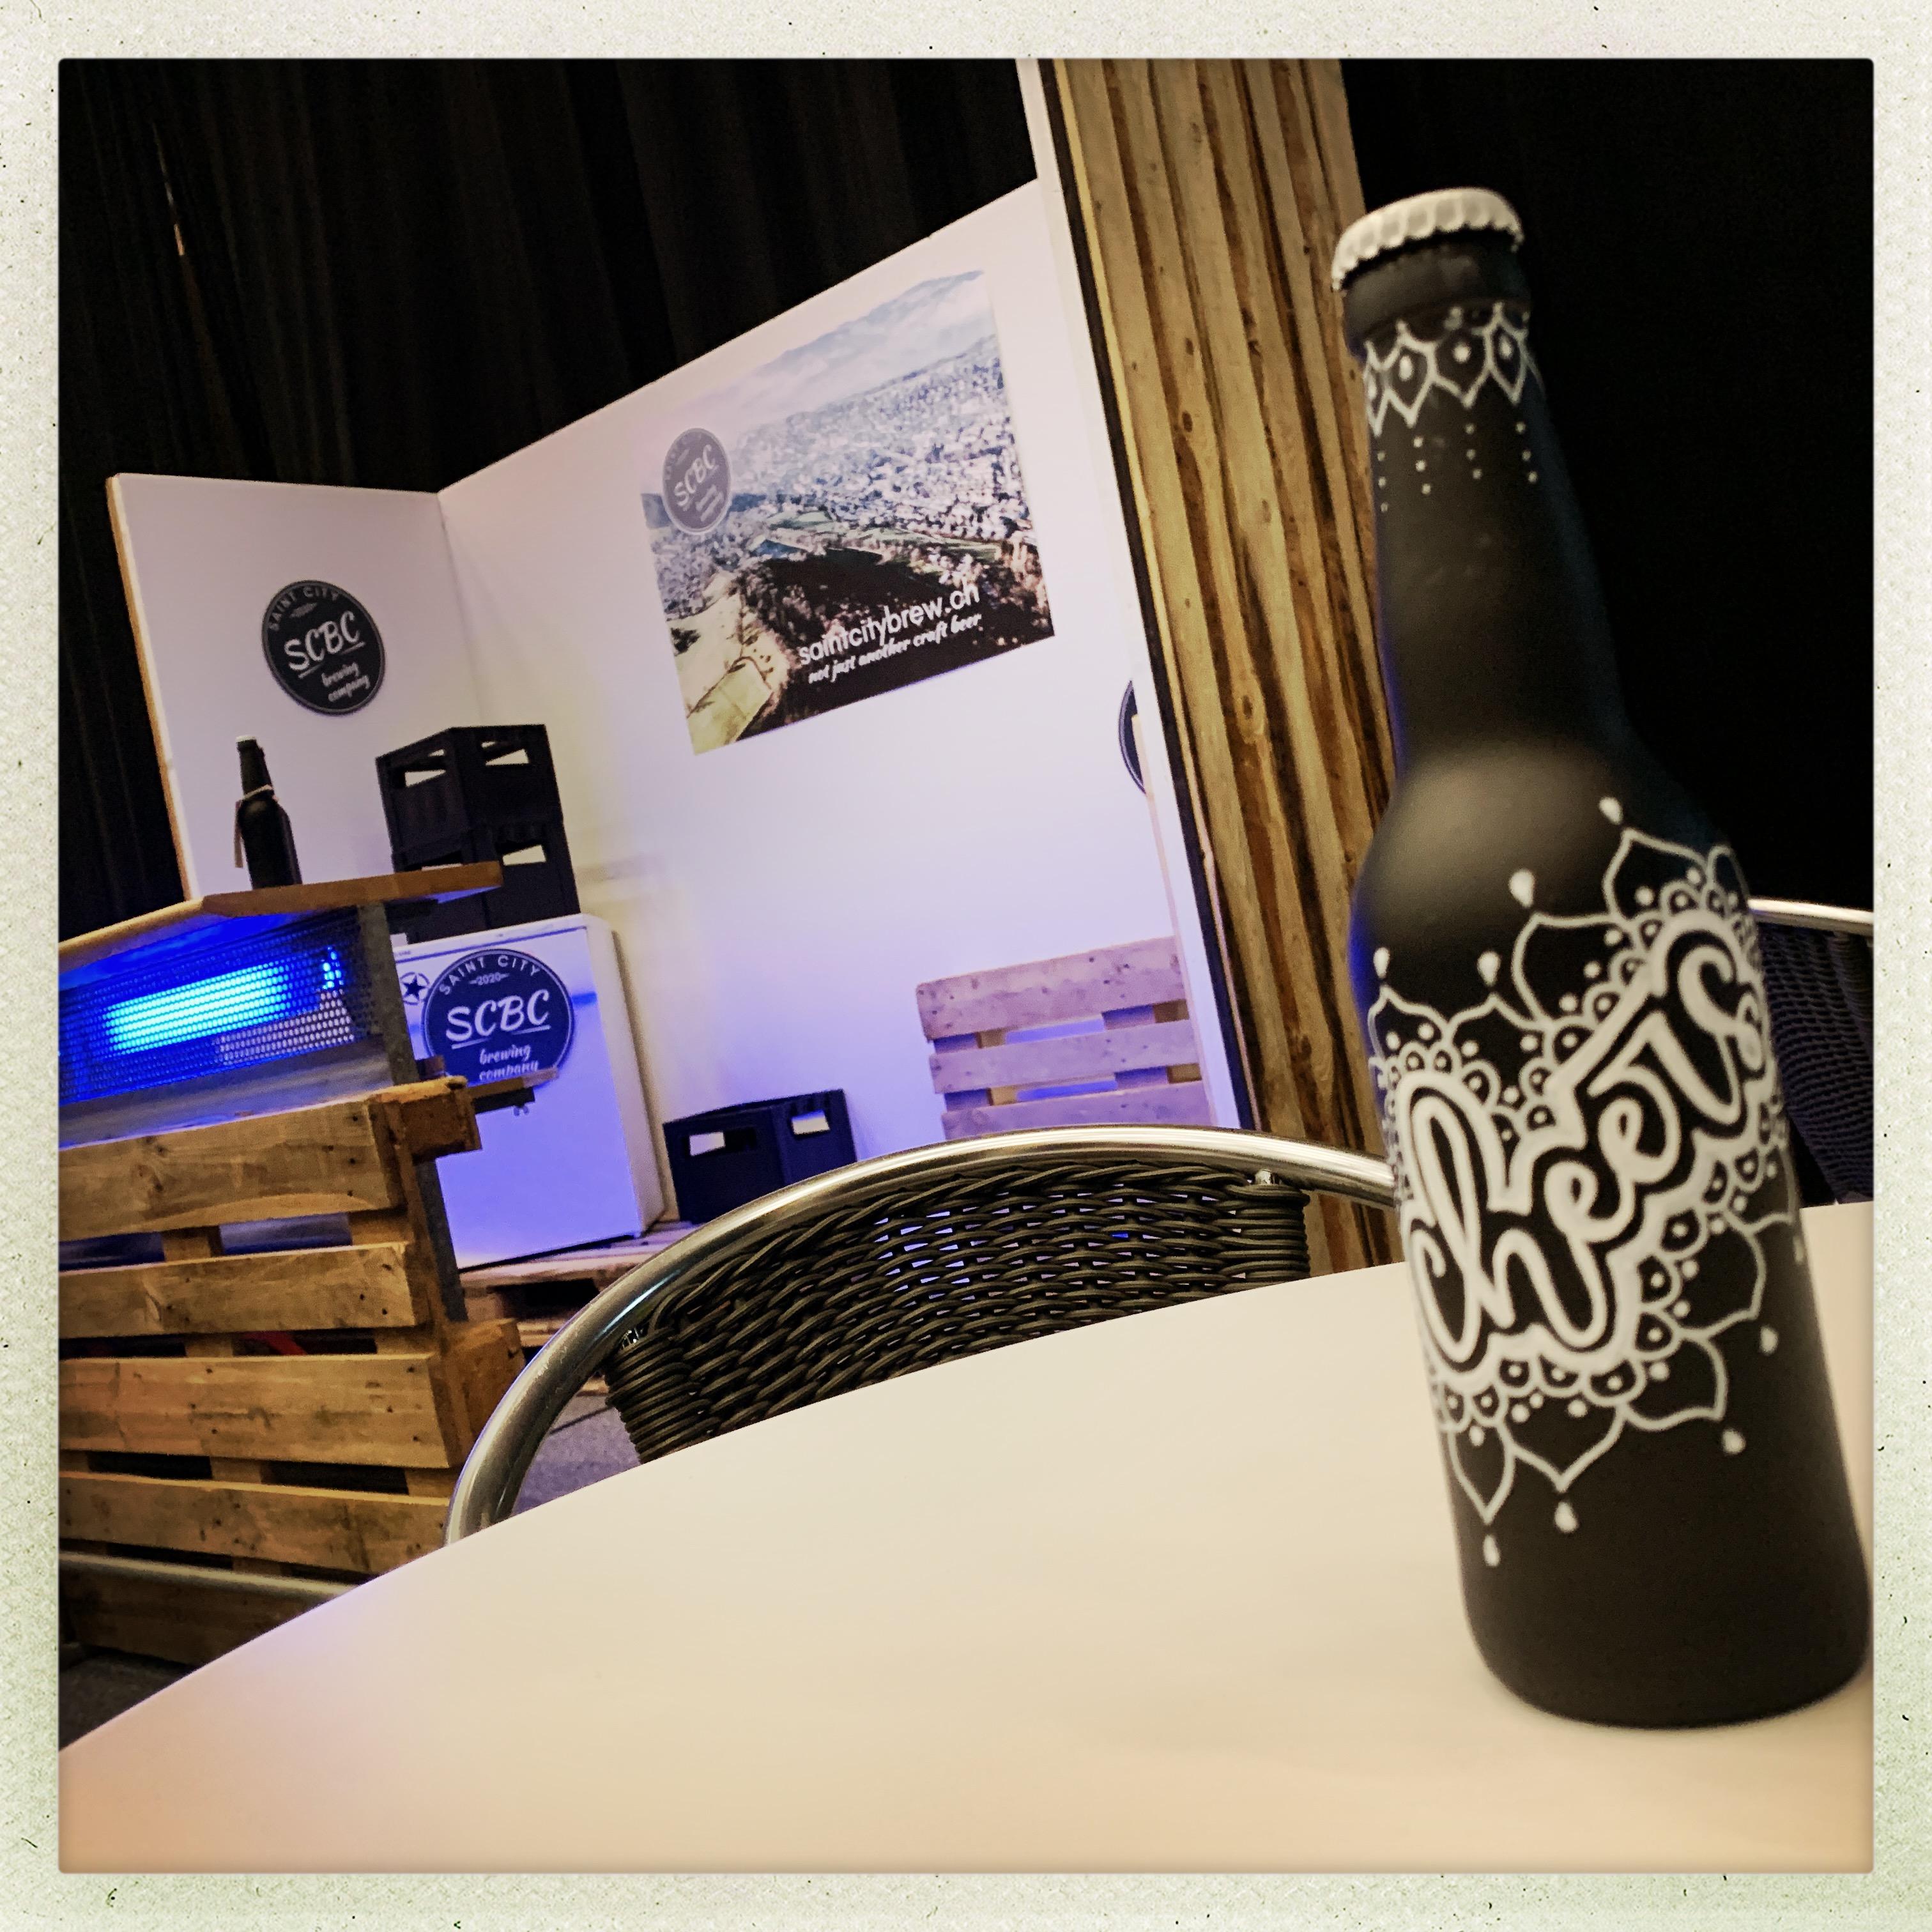 saint city brewing company